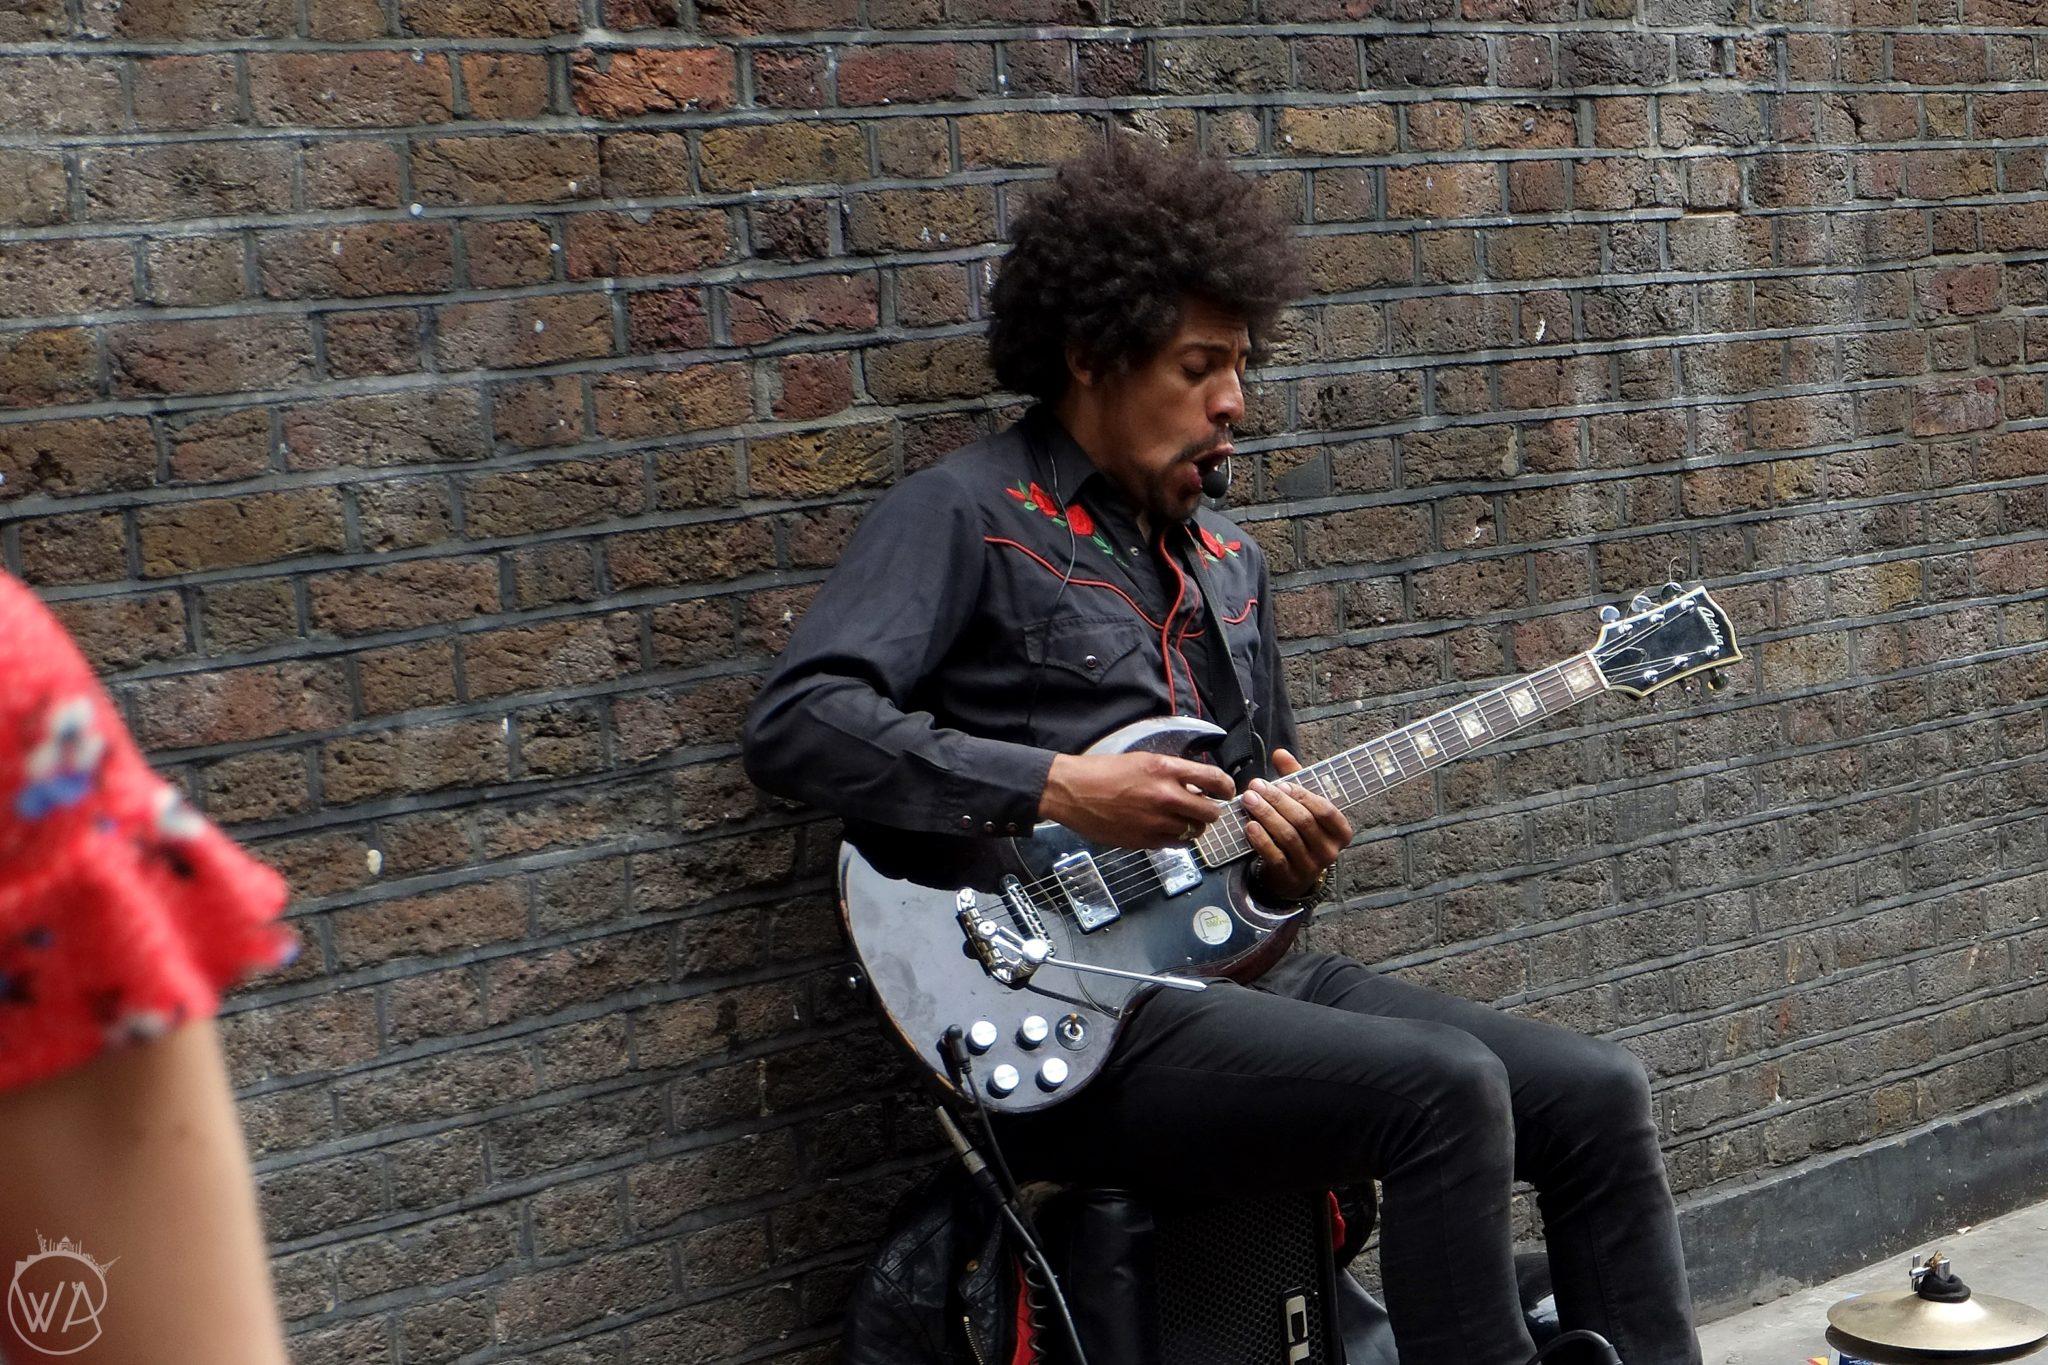 Music artists Brick lane